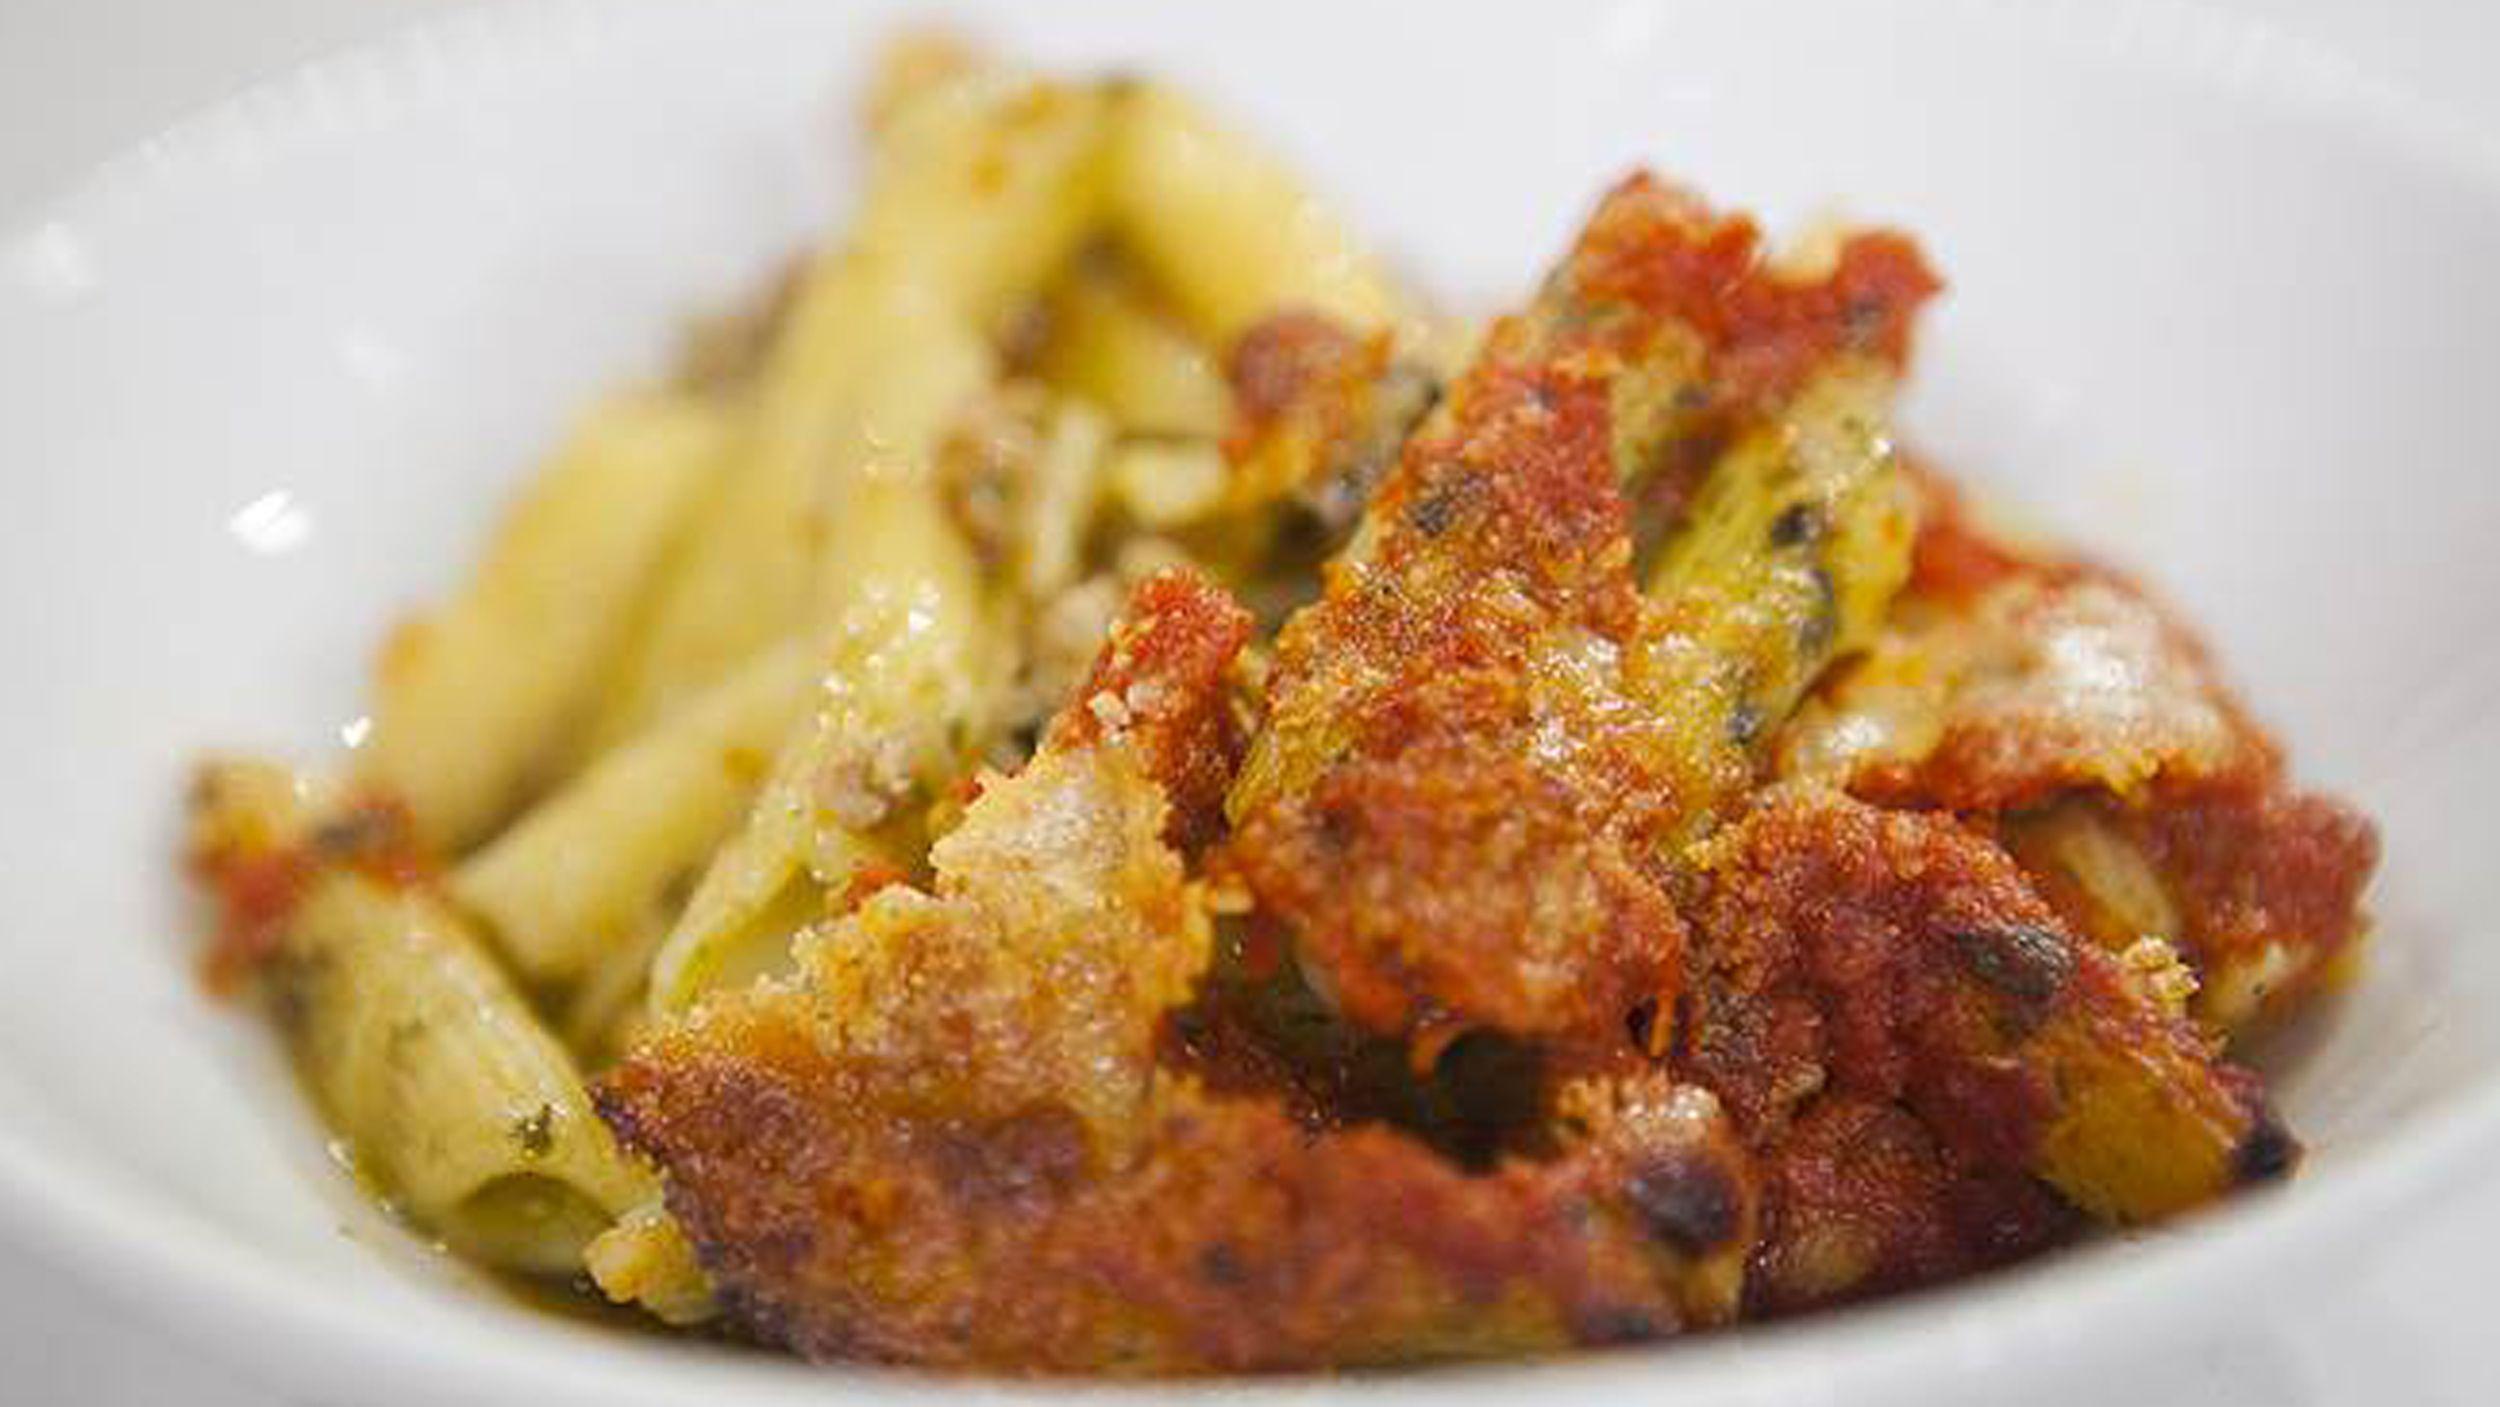 Giada De Laurentiis' baked pesto pasta casserole Recipe